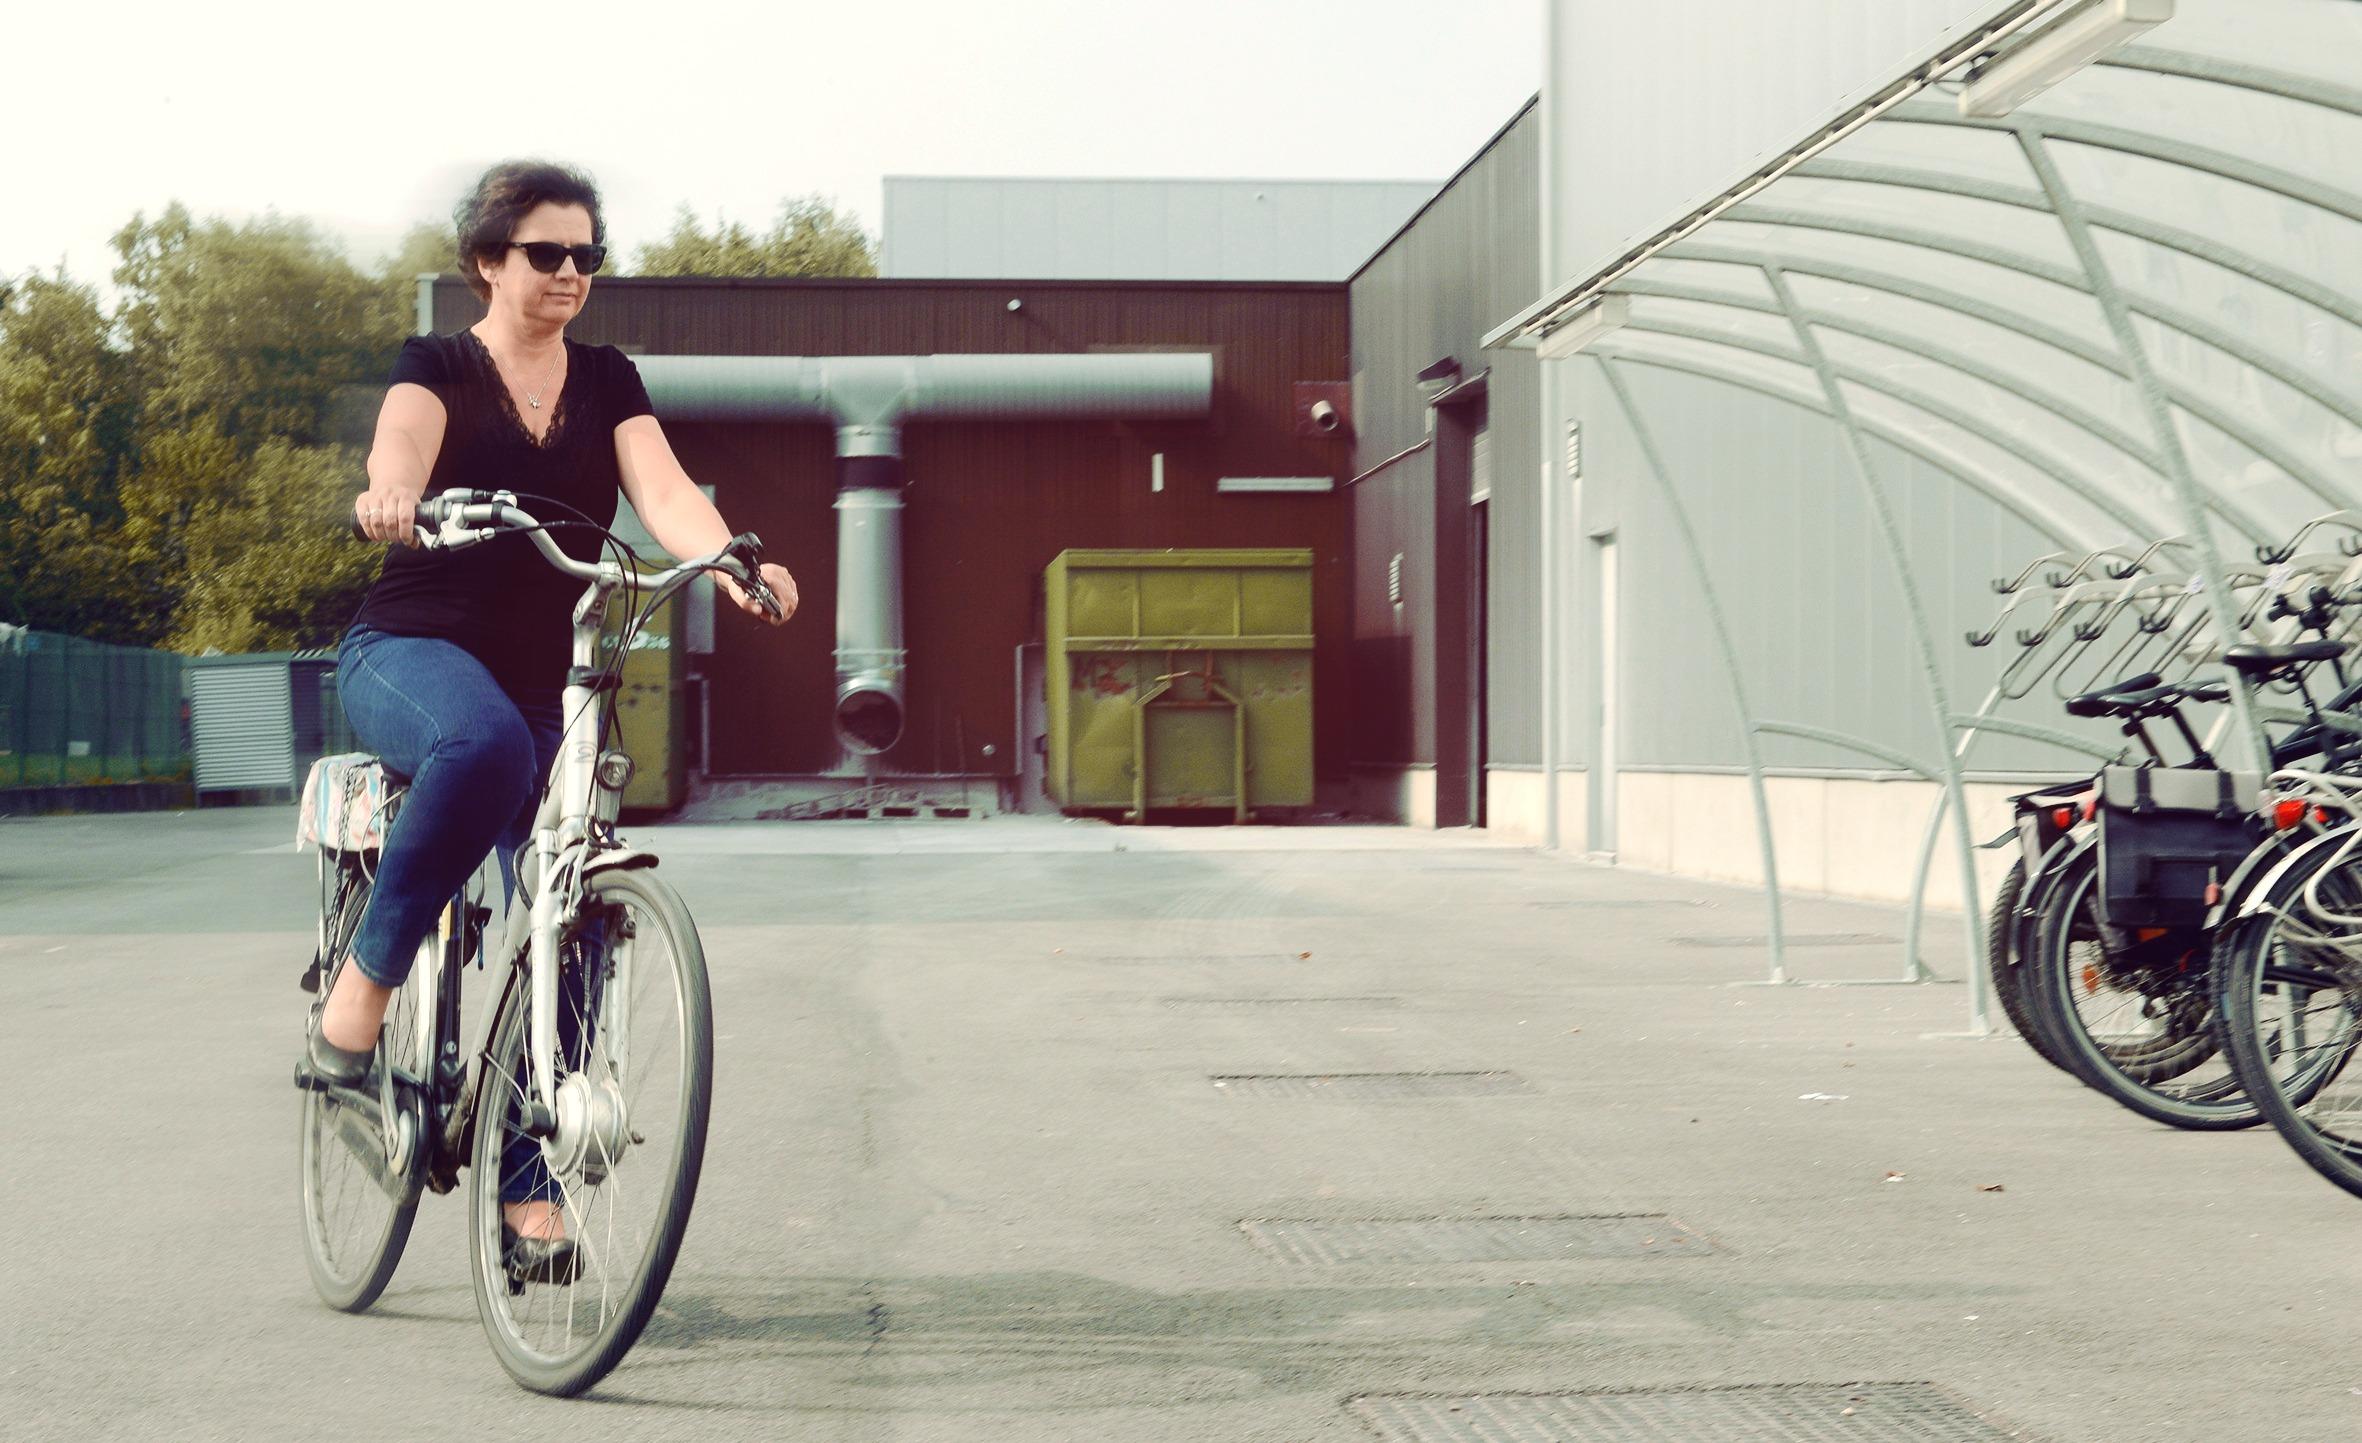 Deelnemer fietsenproject artoos group